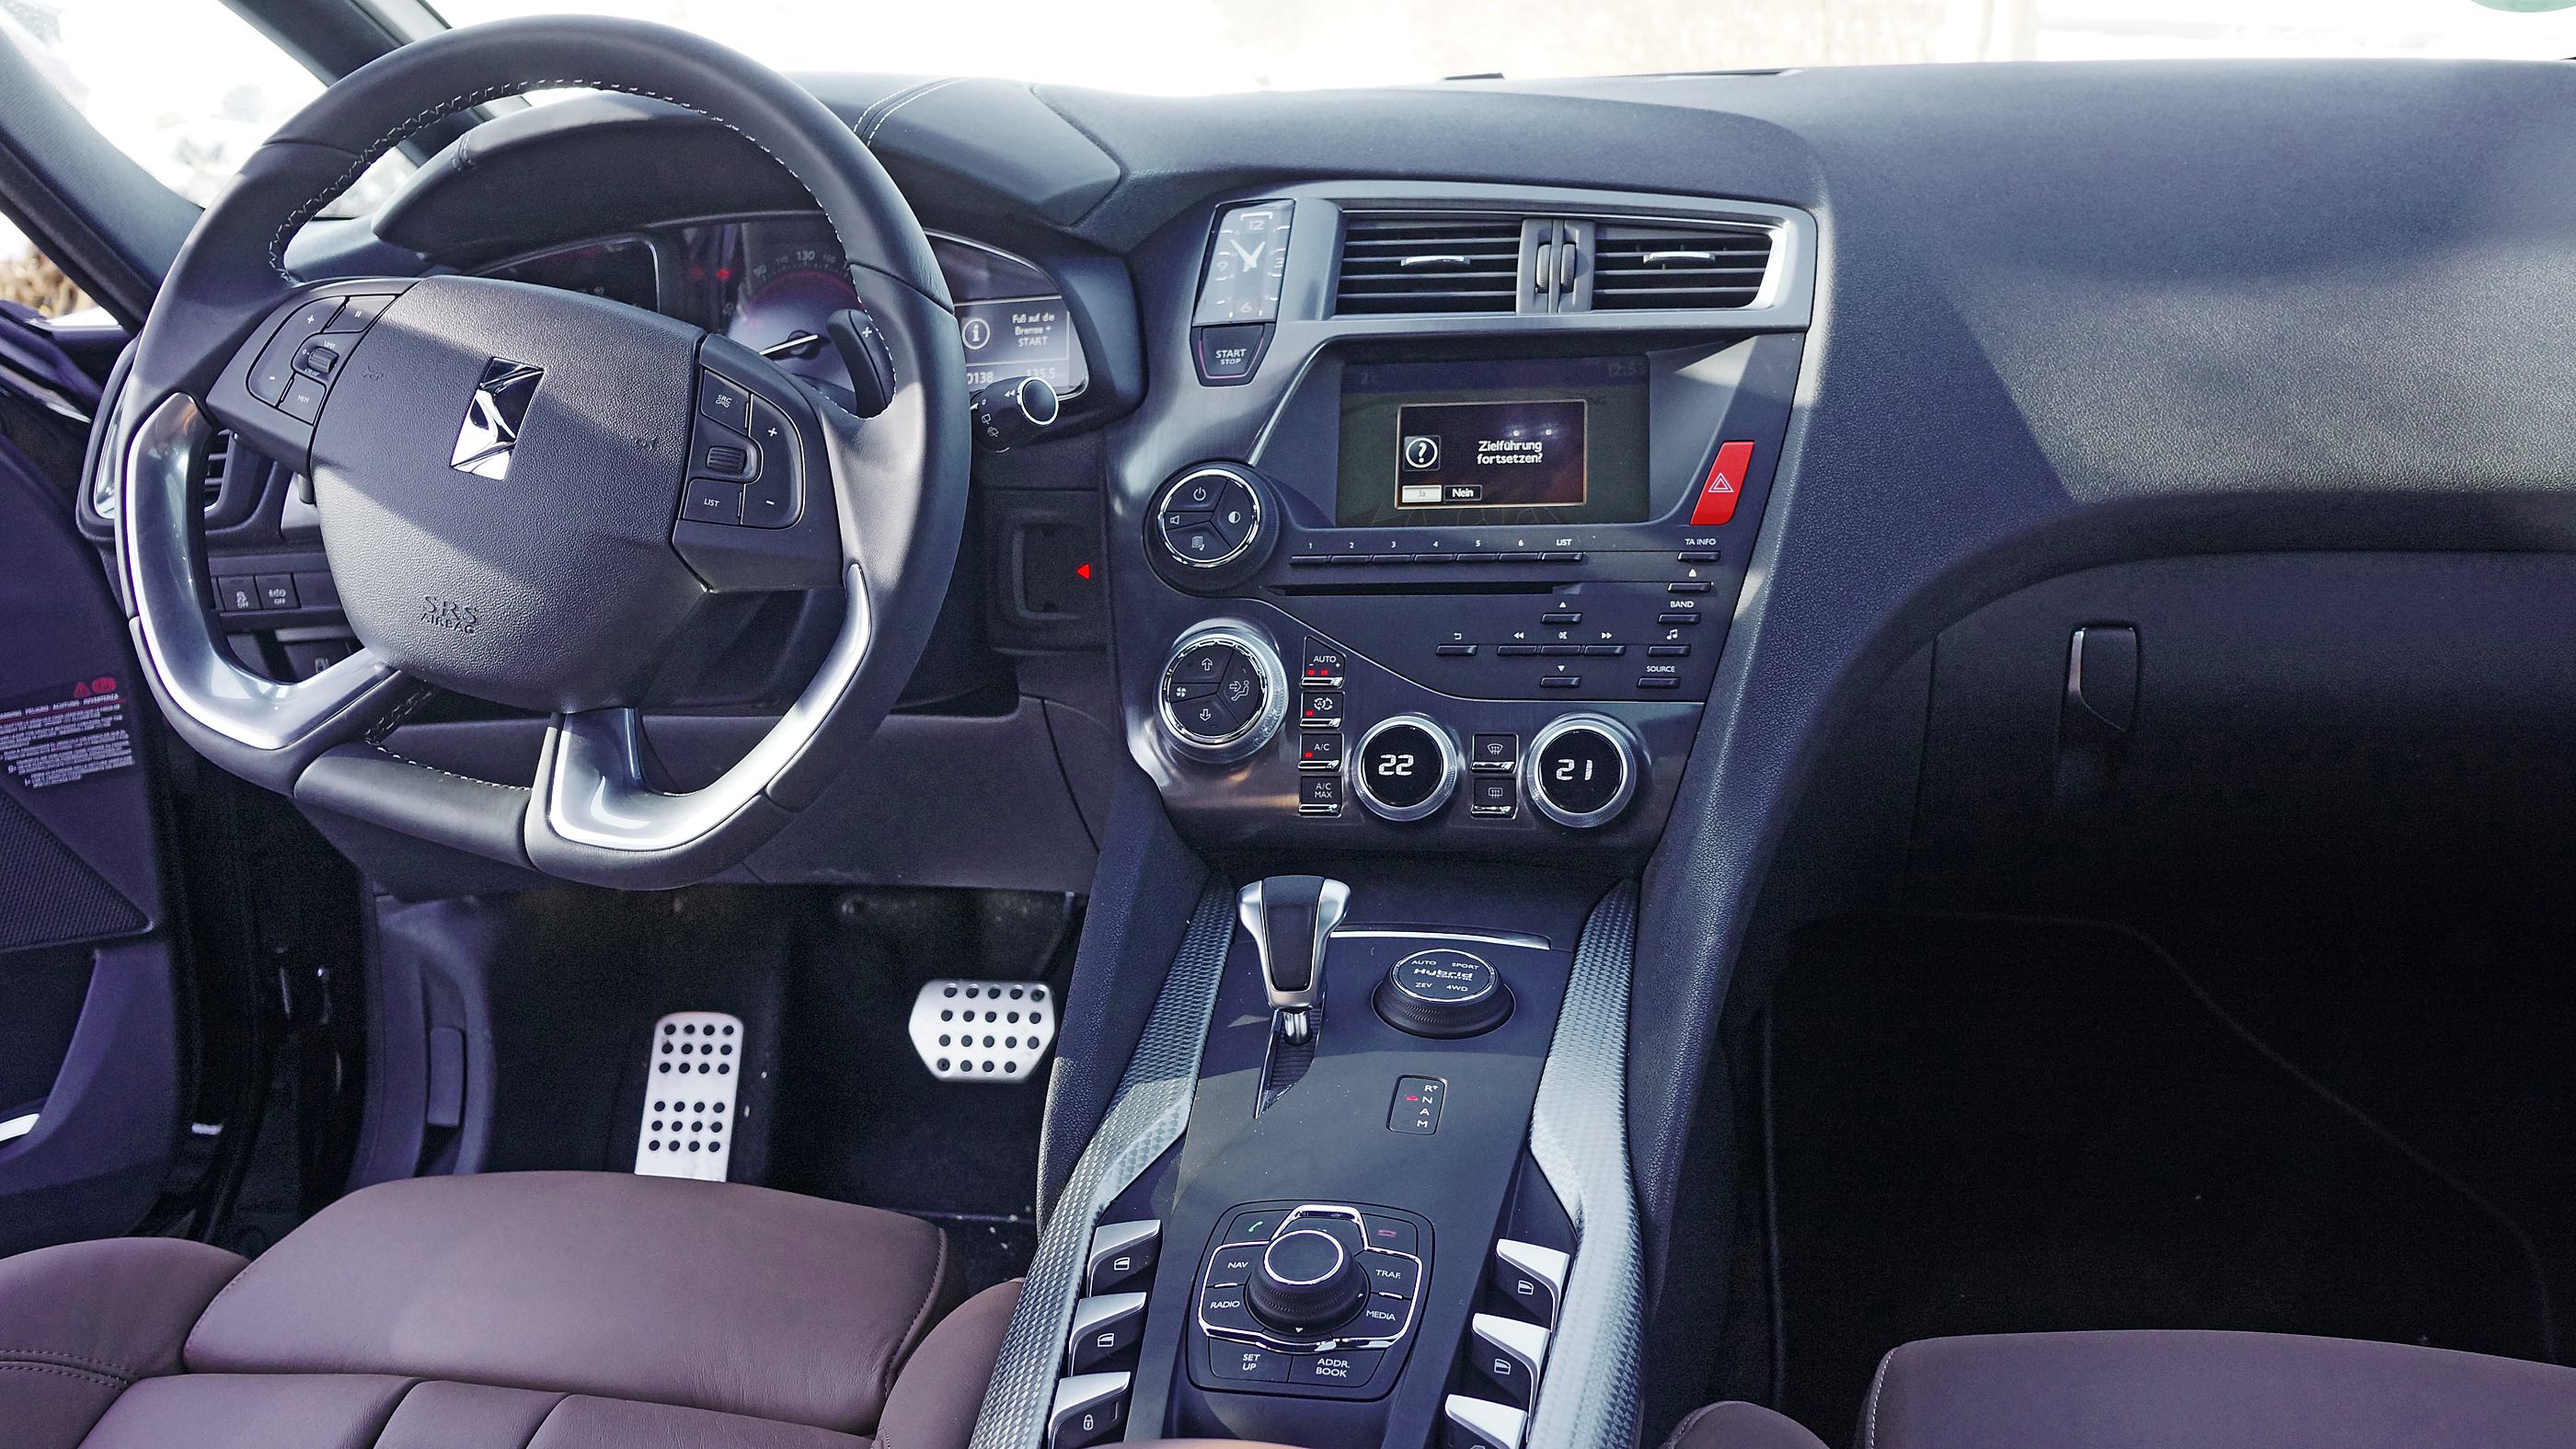 Citroen DS 5 Hybrid Cockpit